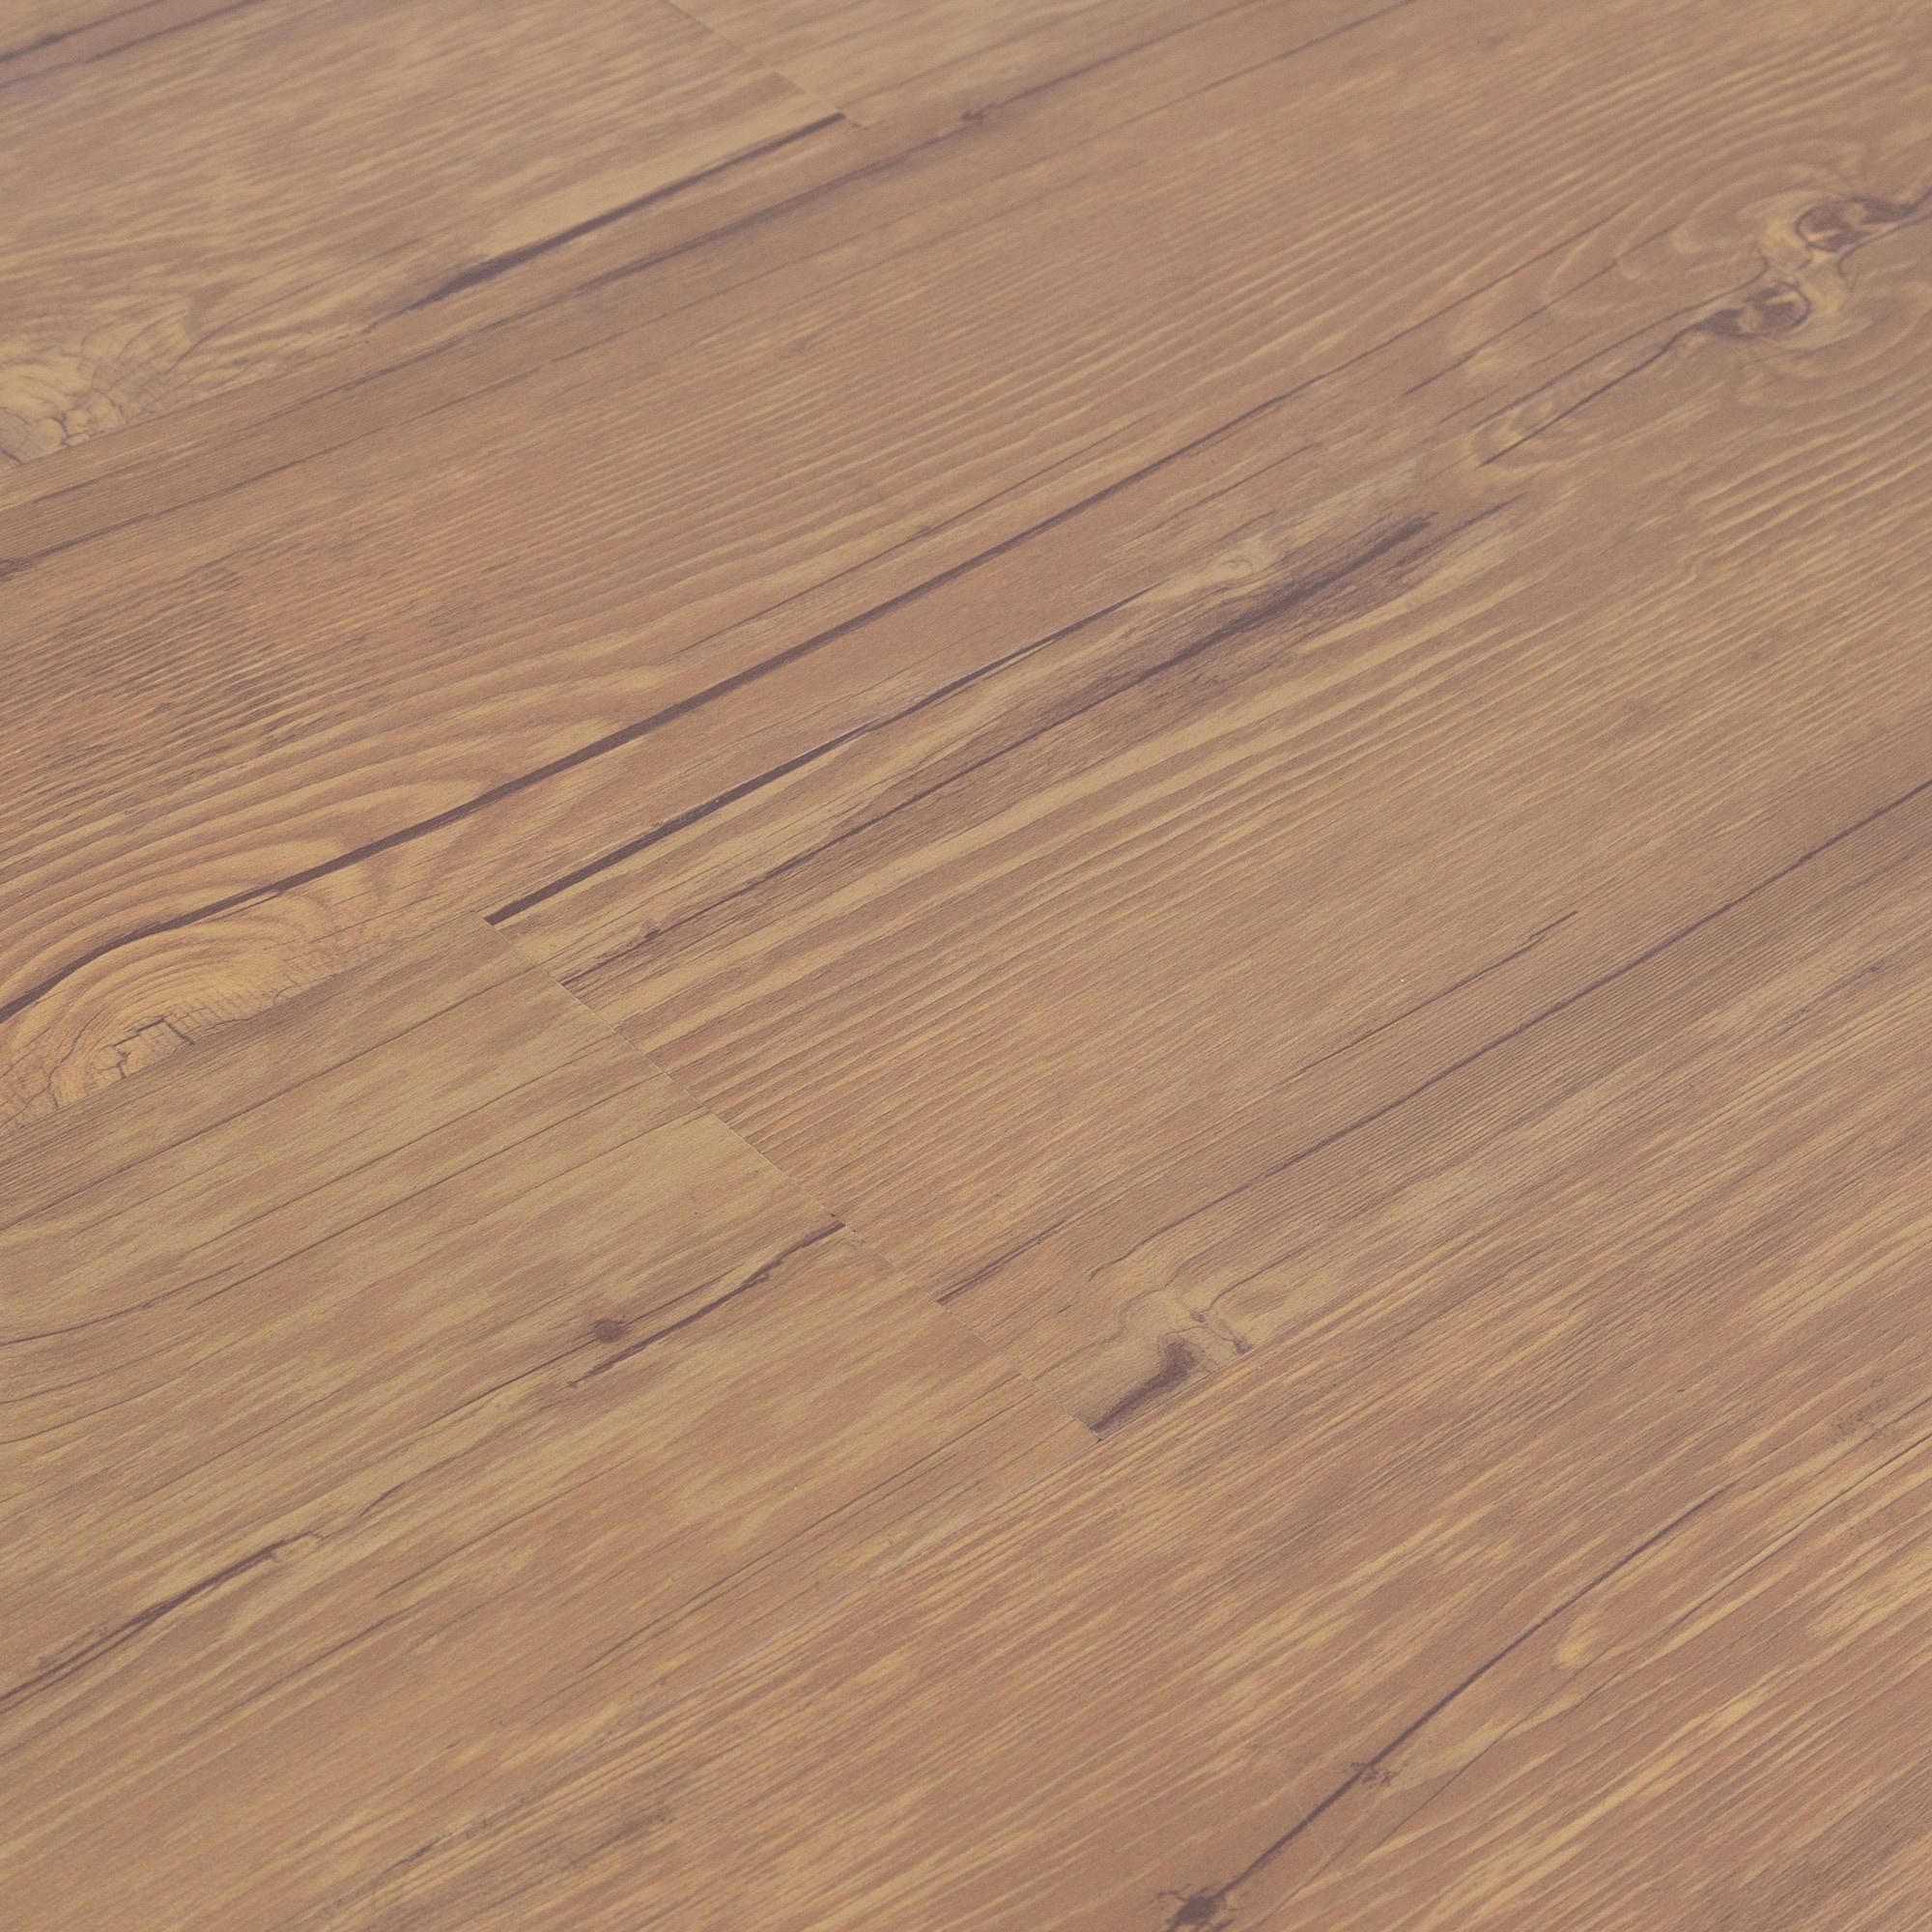 Saddle / 1.2mm / PVC / Peel & Stick Vinyl Planks - 1.2mm PVC Peel & Stick - Sterling Collection 0